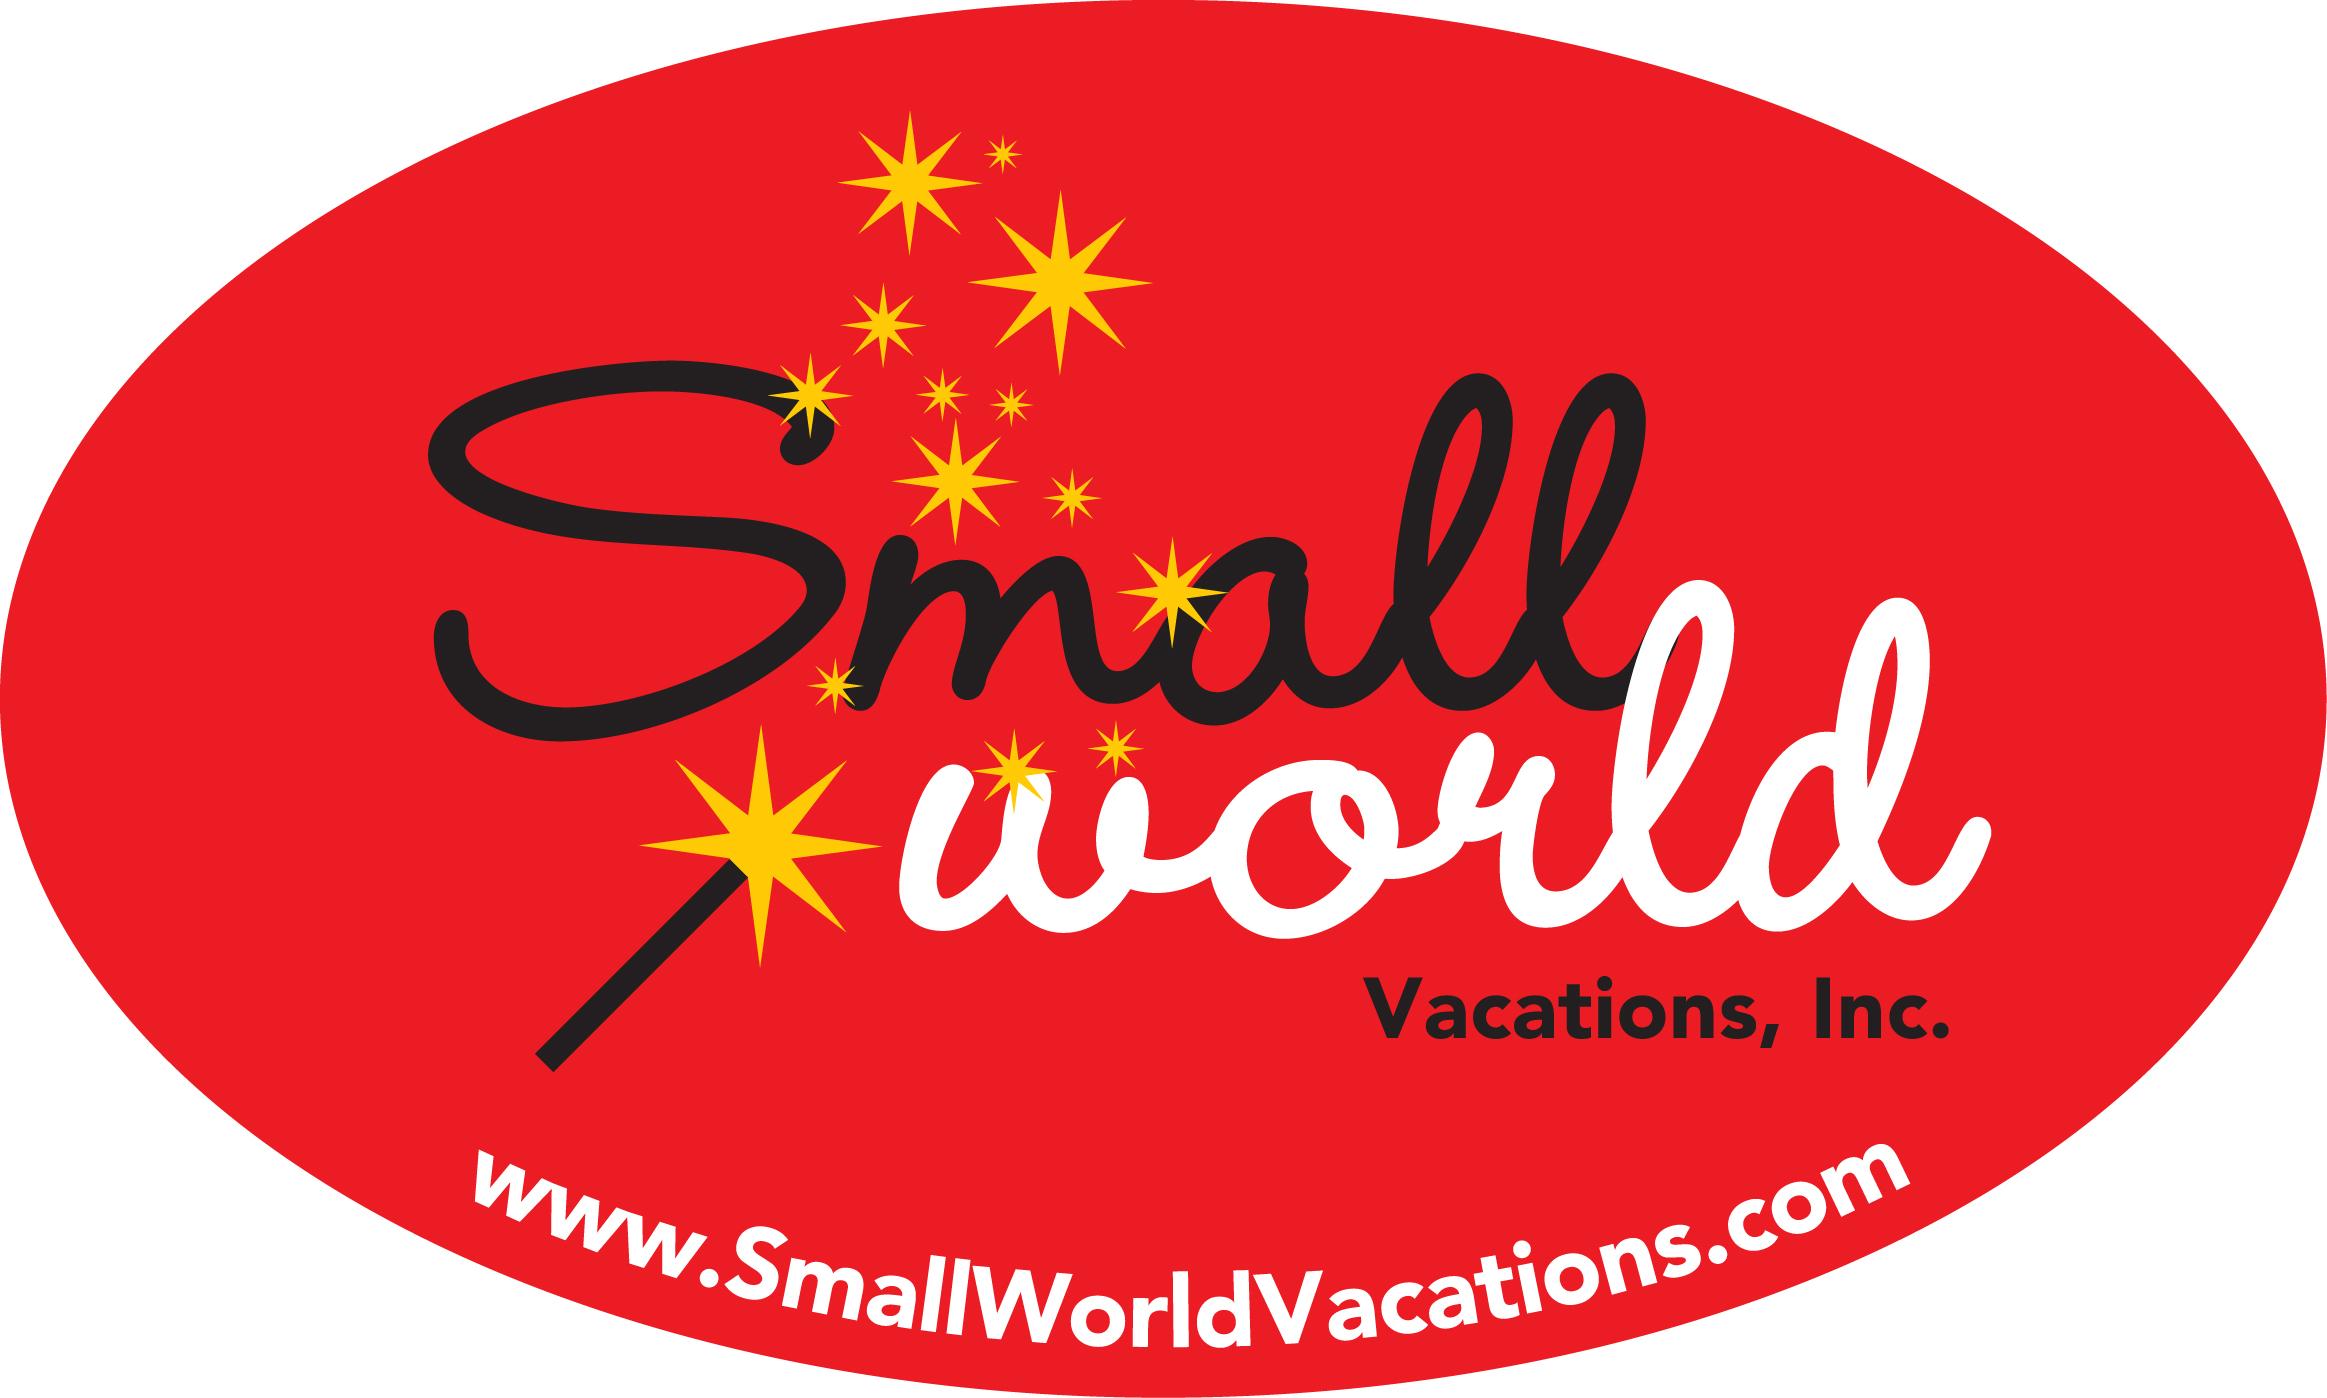 Small World Vacations Official Disneyexaminer Travel Agent Logo